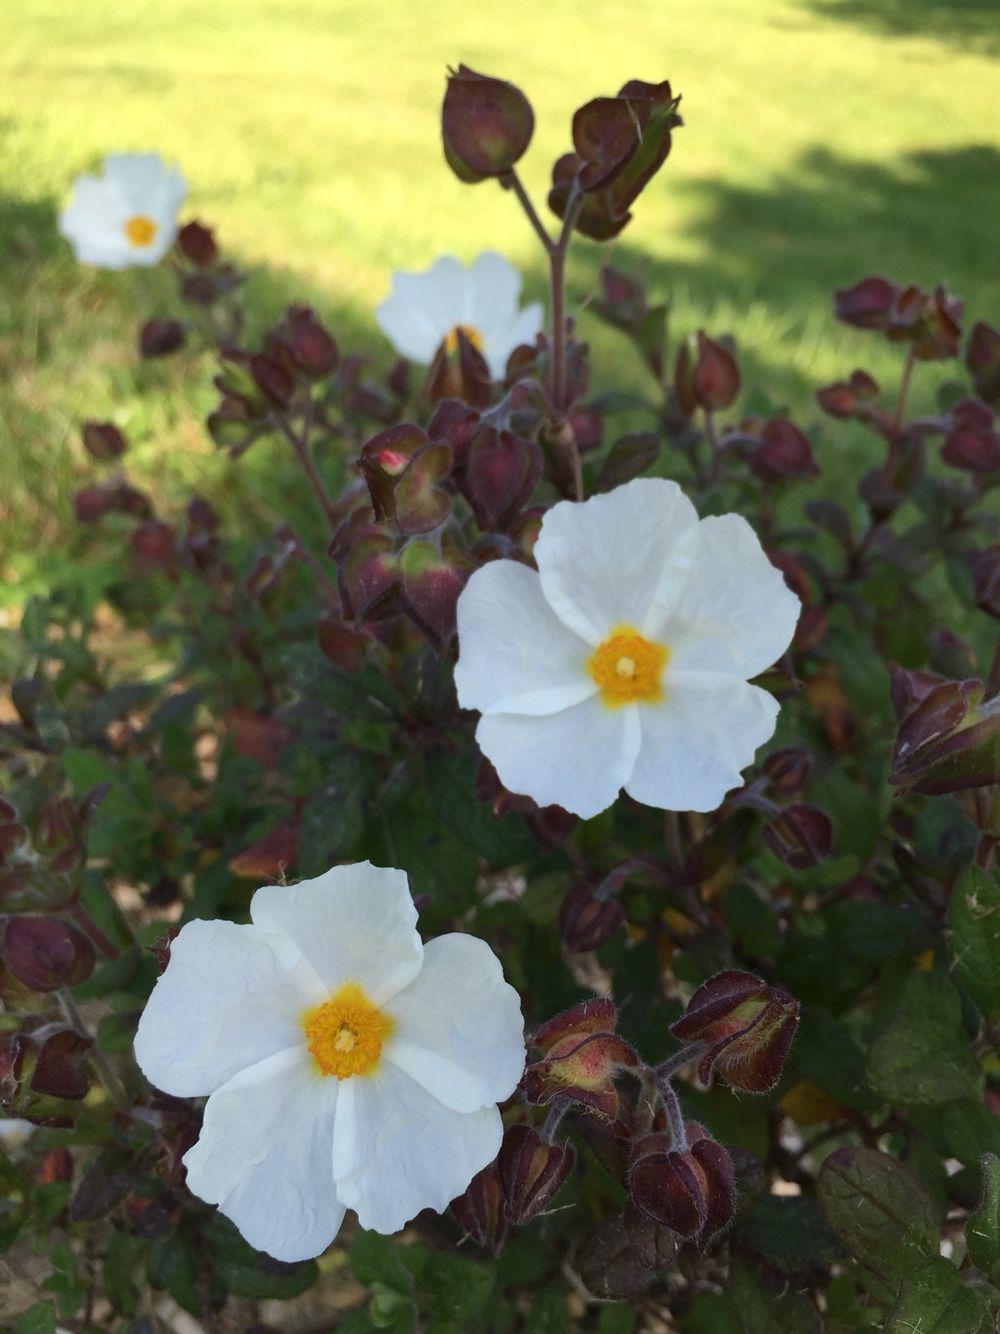 Arbutus unedo Erecta | Boomkwekerij, Kleine tuinen, Tuin